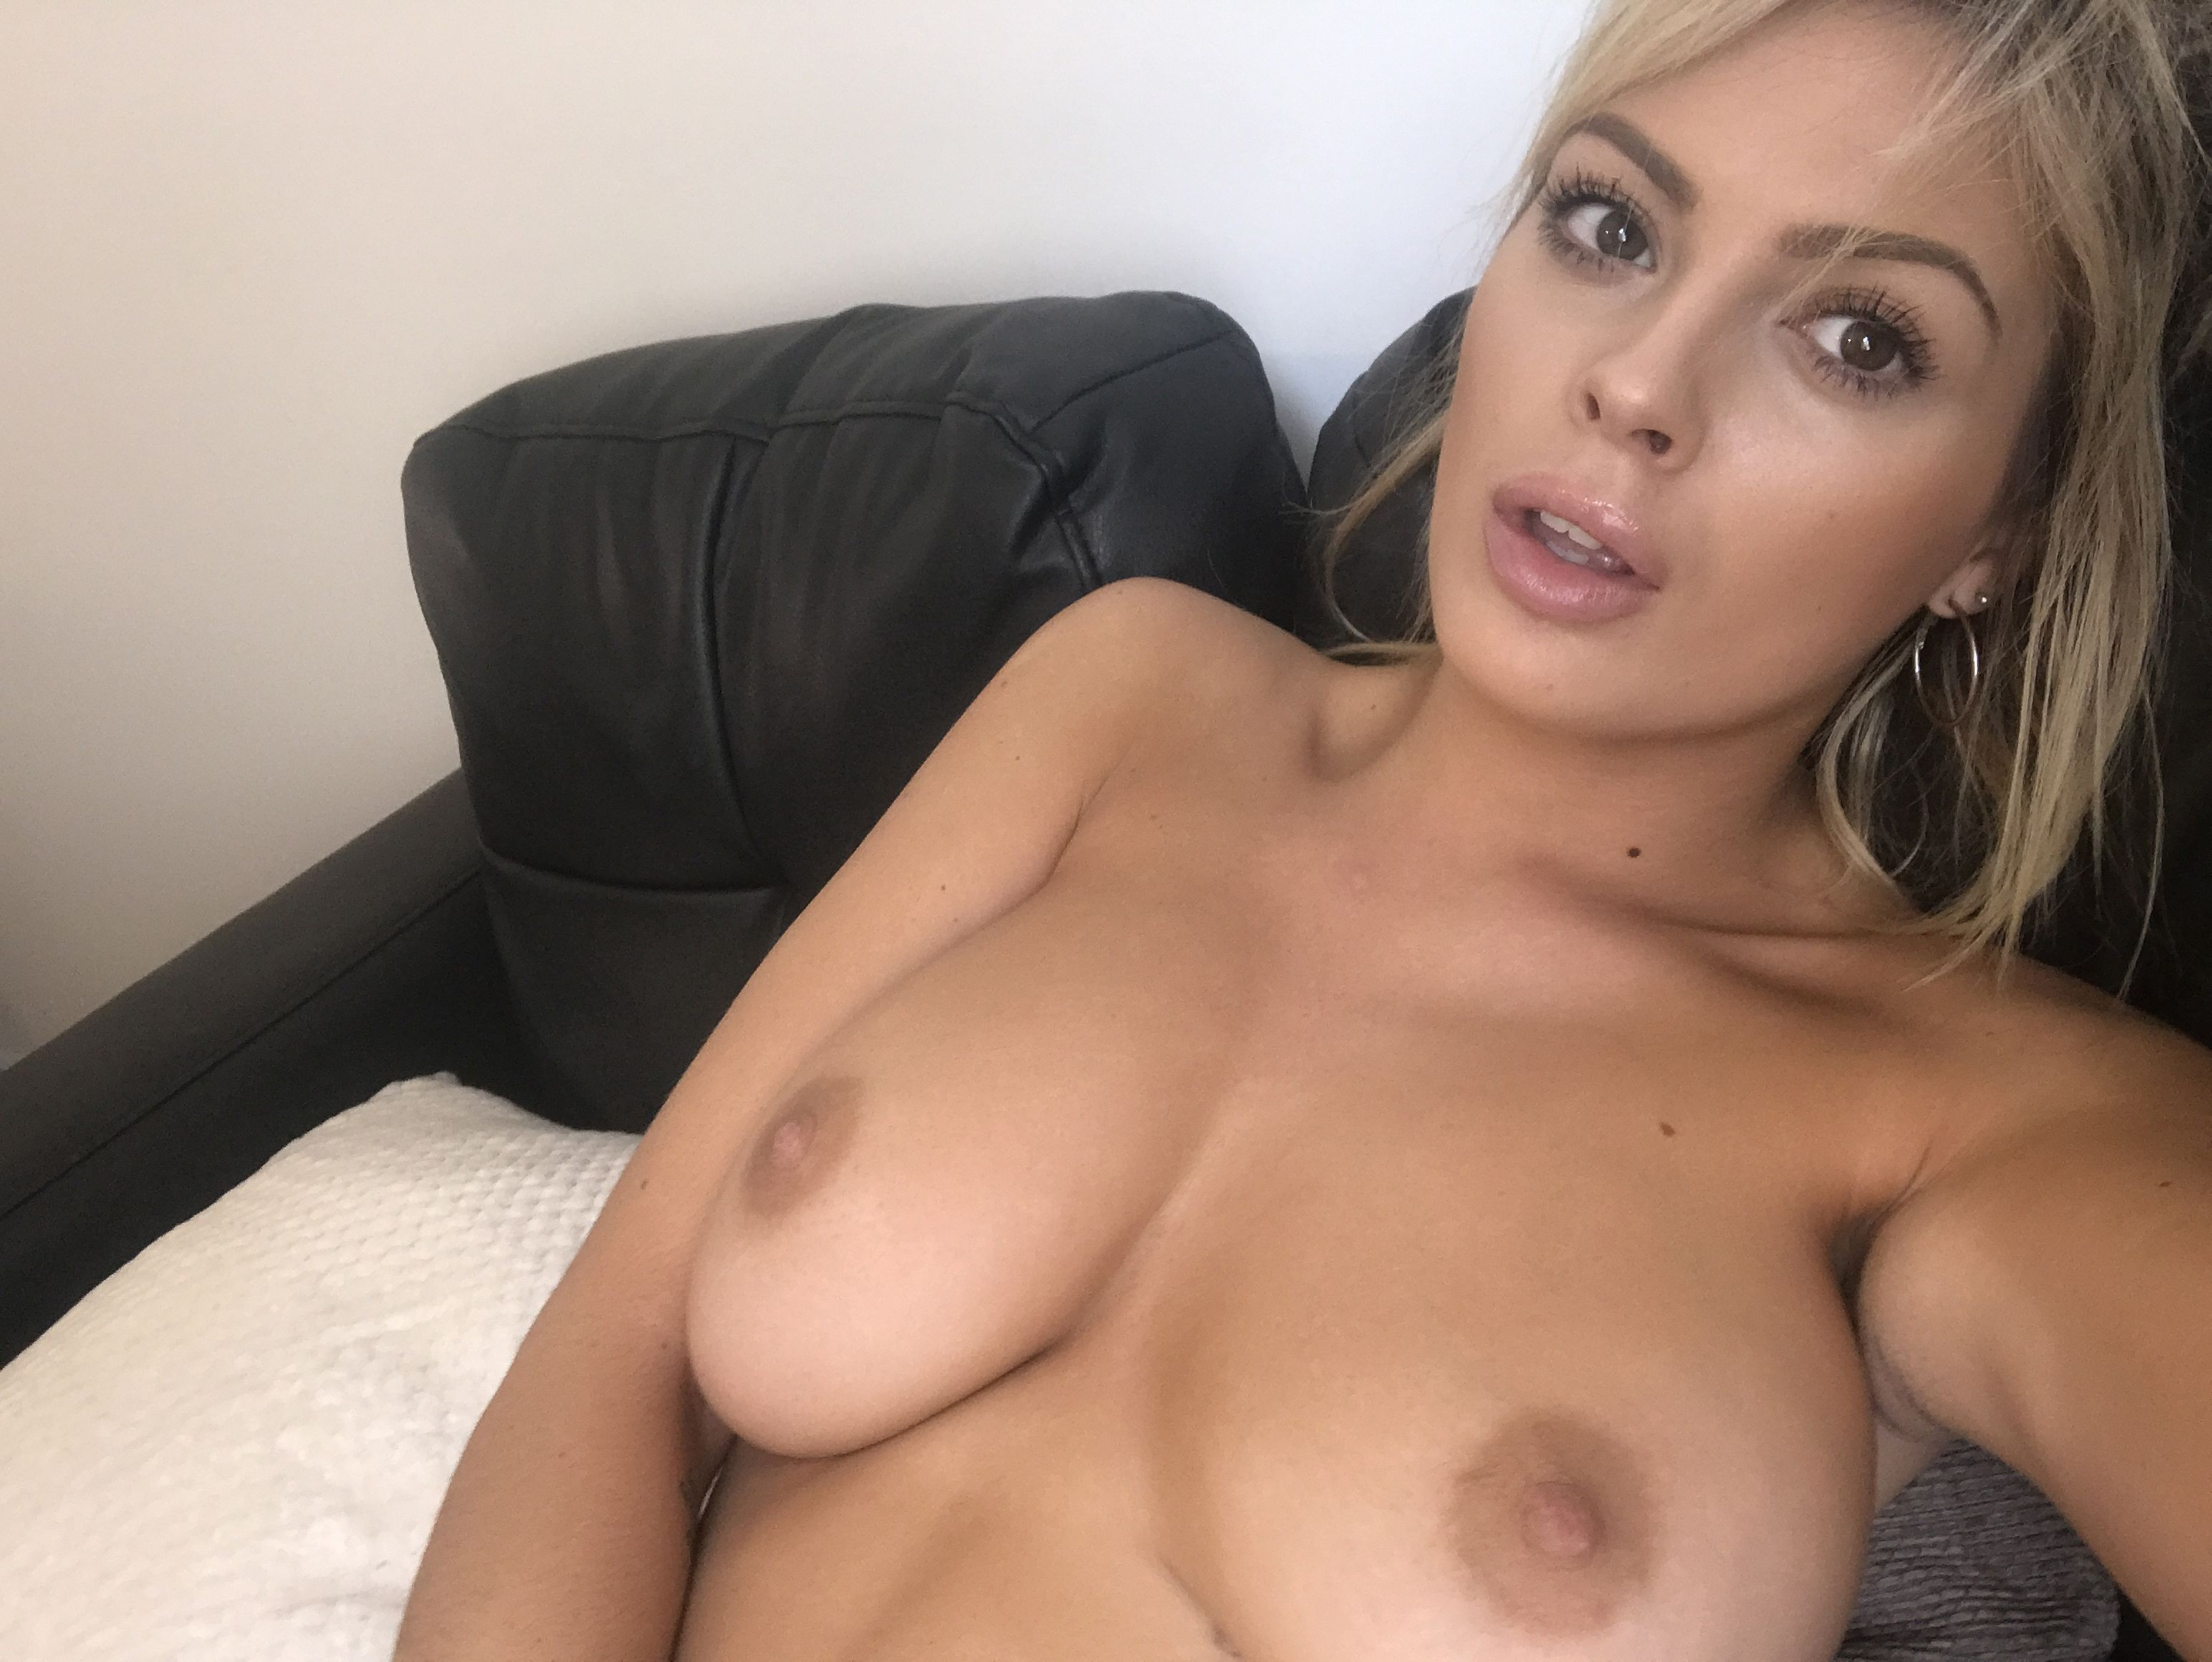 Sandra de marco shows off her body - 2 1